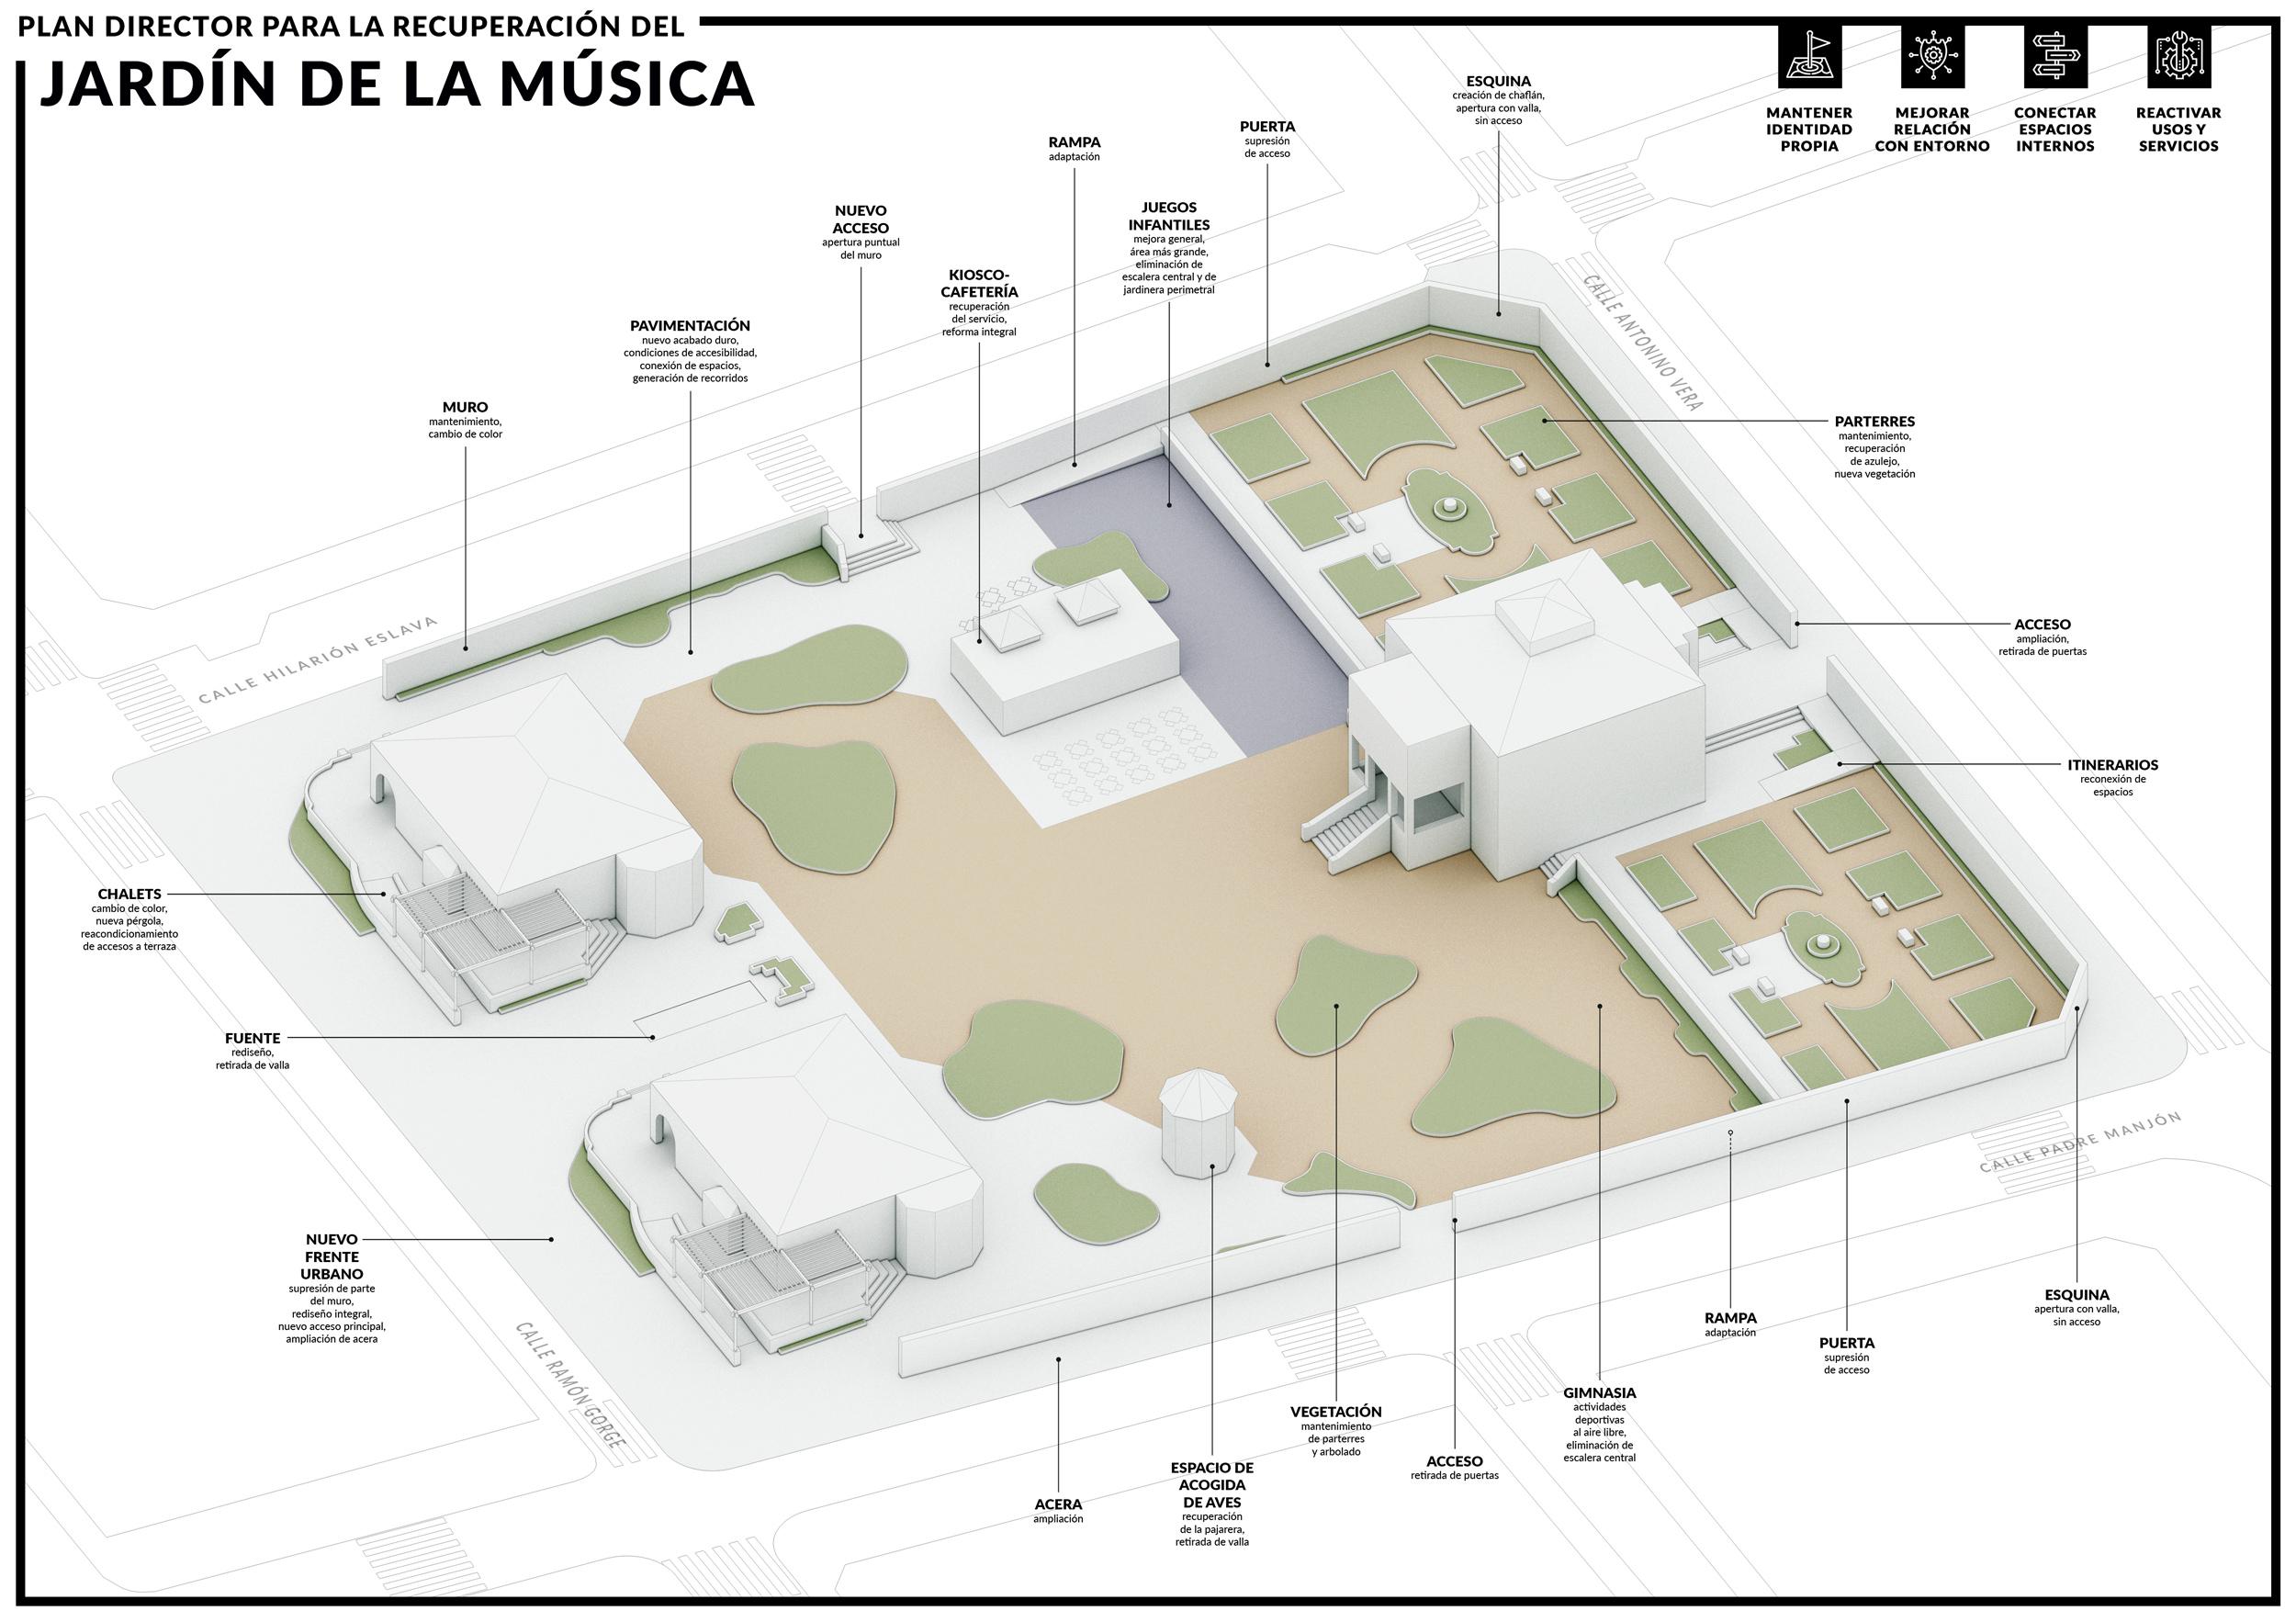 plan-director-jardin-de-la-musica-elda-casa-grande-01-axonometria.jpg